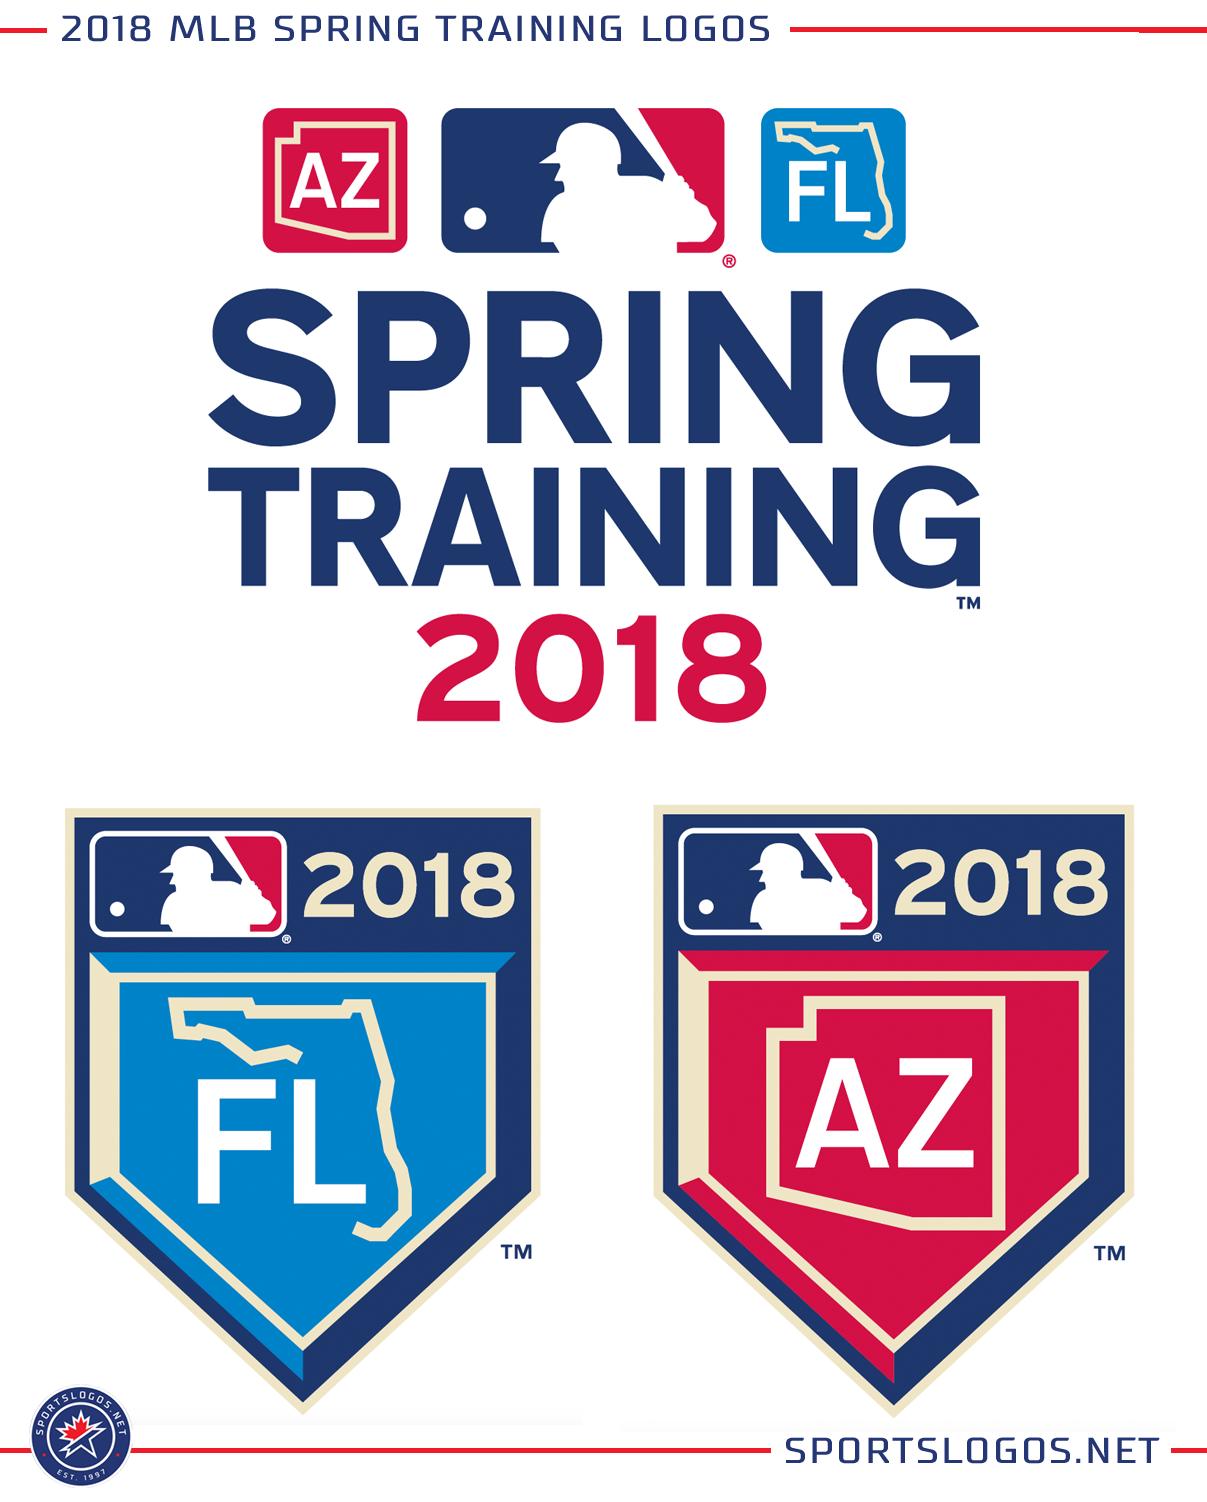 2018 mlb spring training logos chris creamers